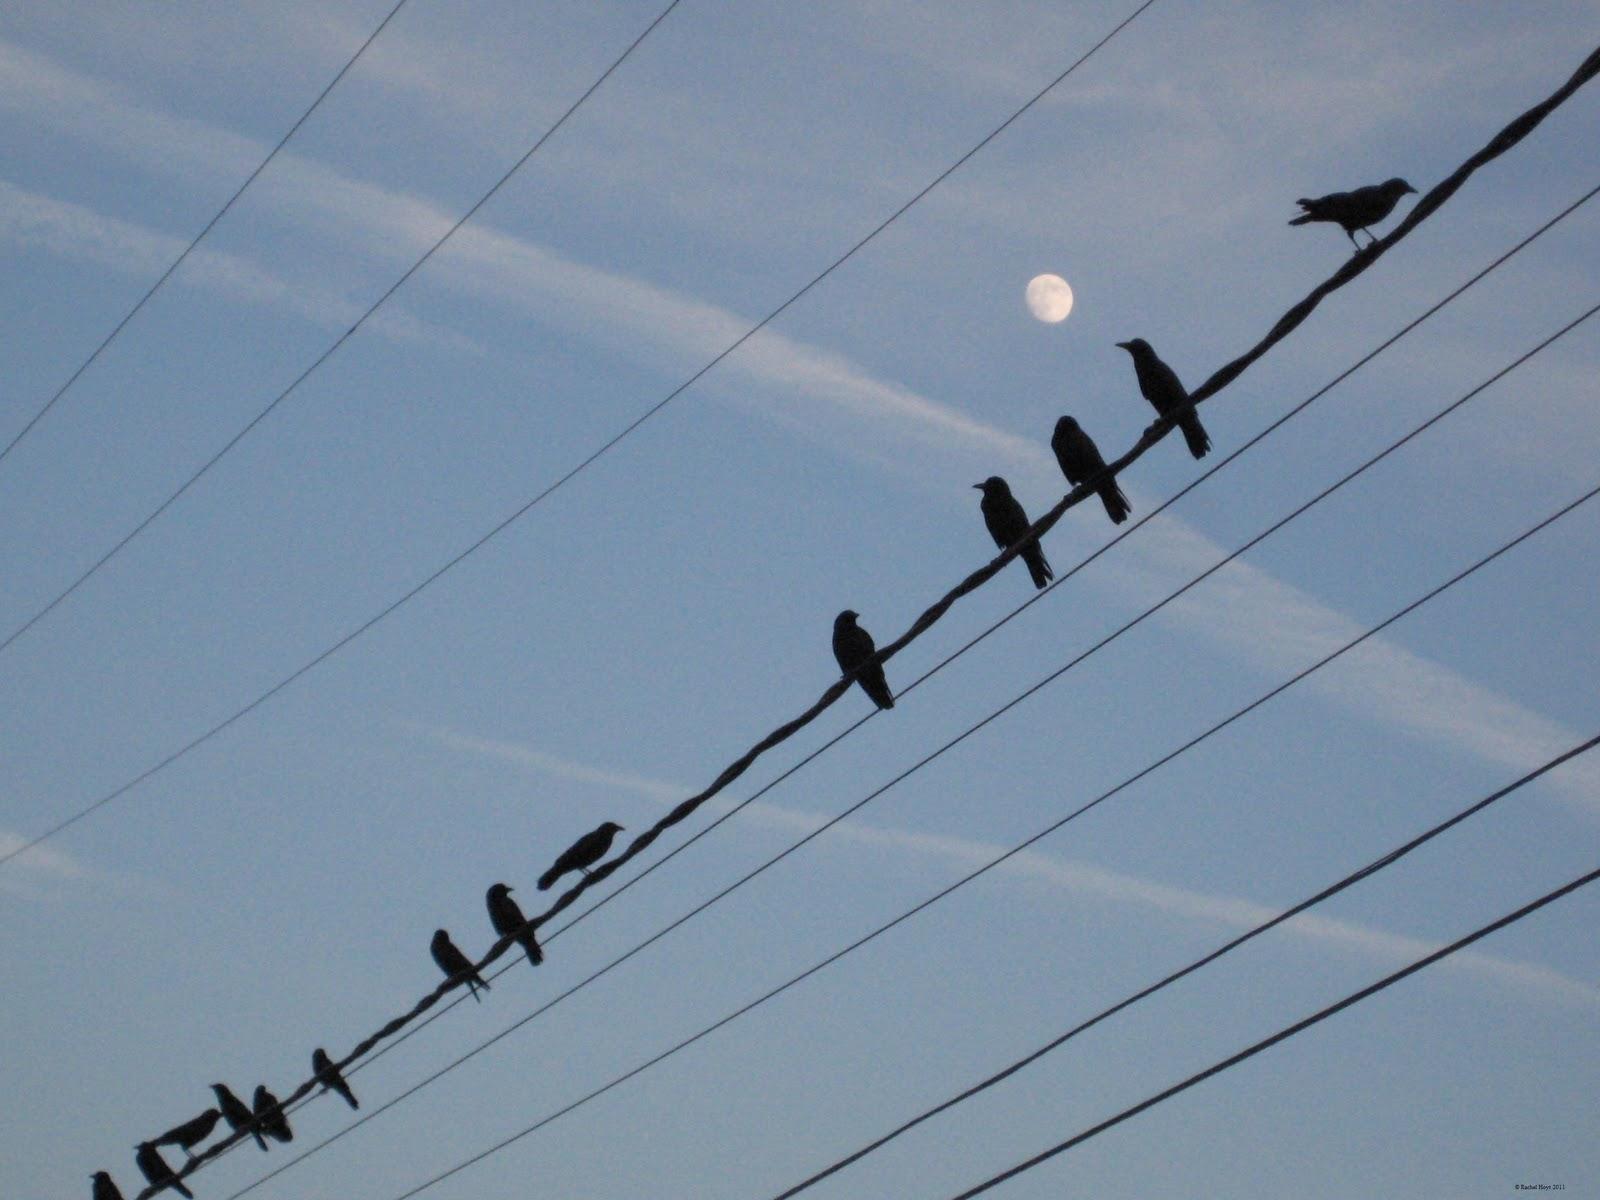 http://1.bp.blogspot.com/_pdo3-widU-s/TS0dWbPwxwI/AAAAAAAAA5E/c15U4NNrarc/s1600/crows.jpg